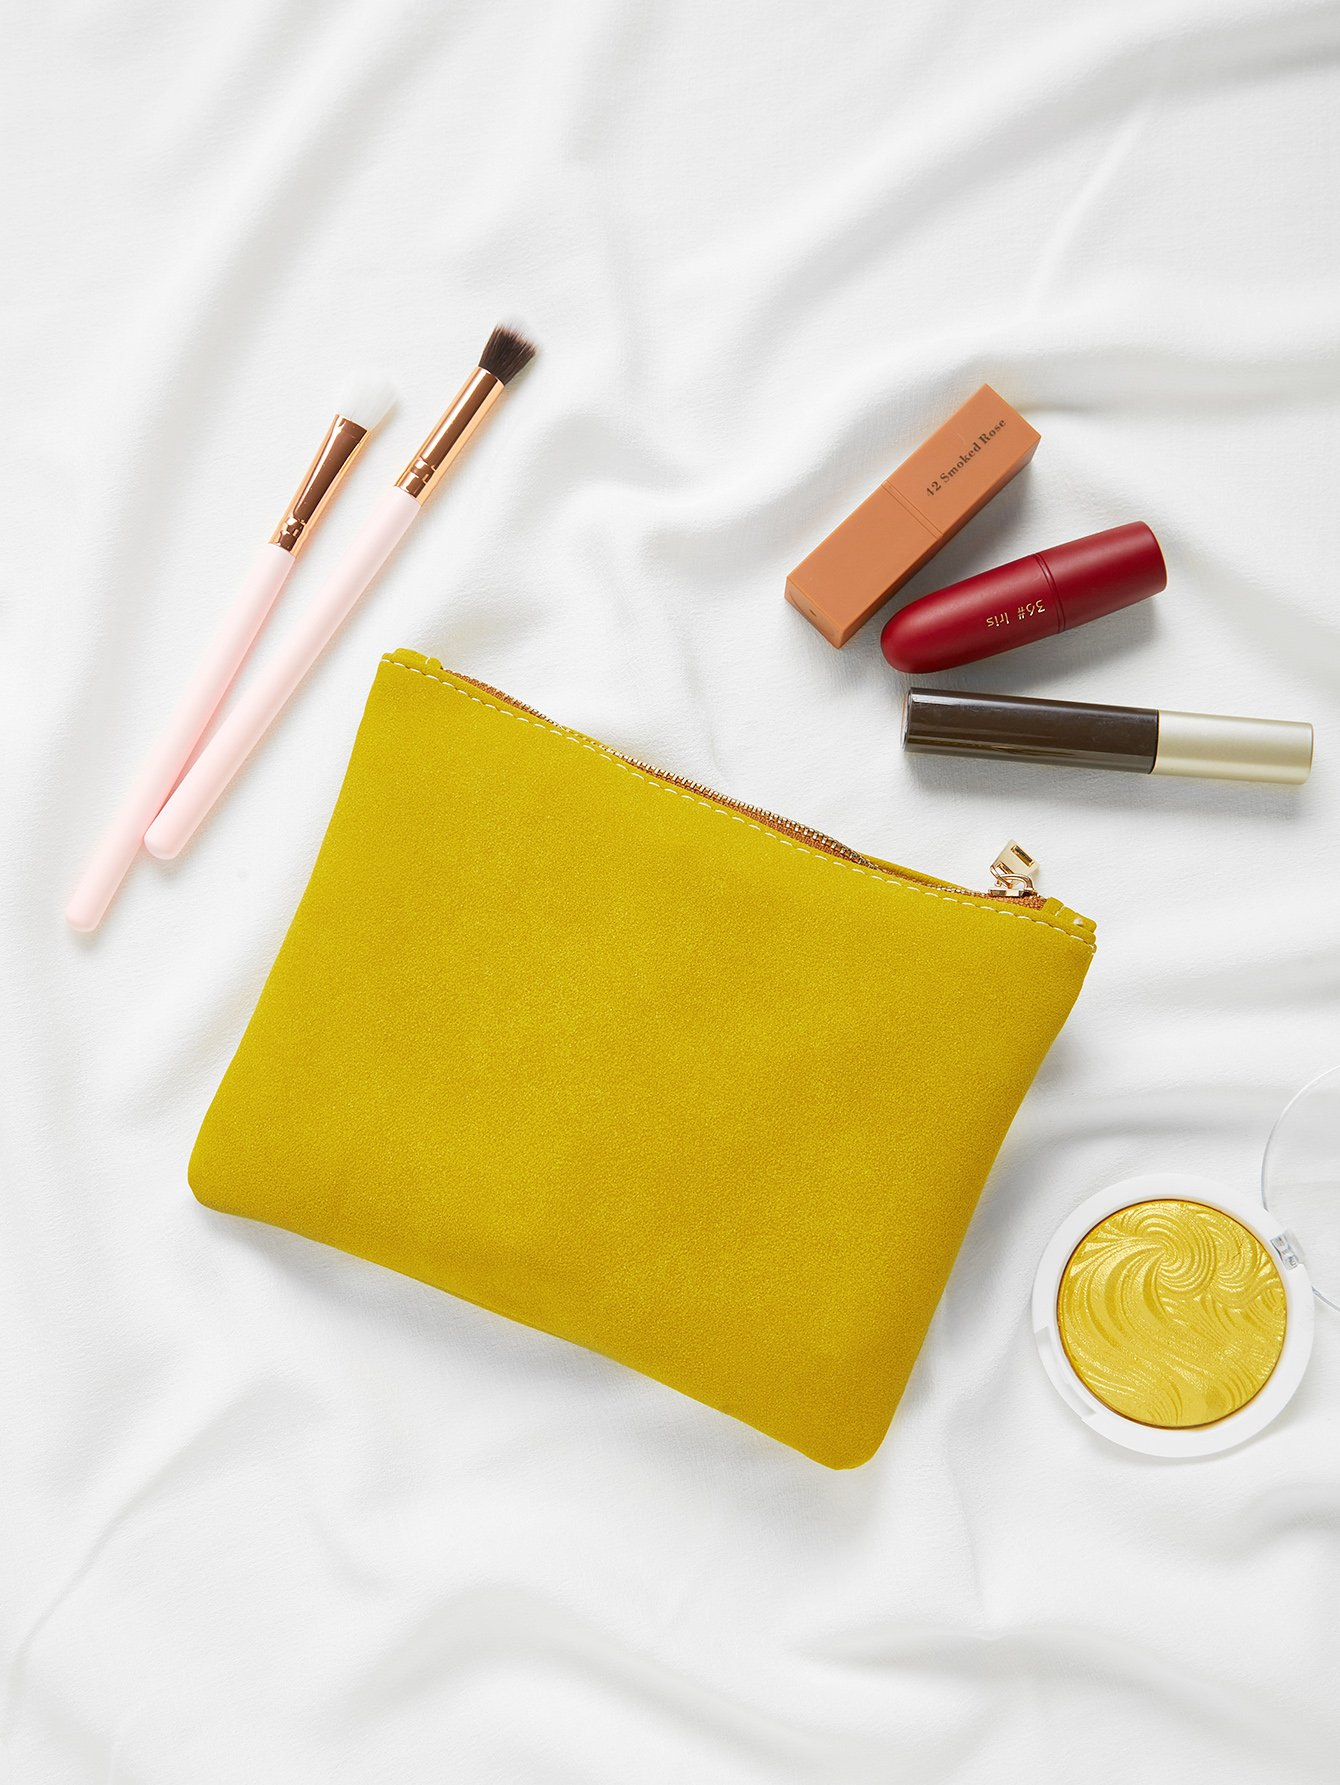 Suede Makeup Bag makeup organizer travel bag women cosmetic bags summer dumpling clutch women packages waterproof cosmetic bag handbag